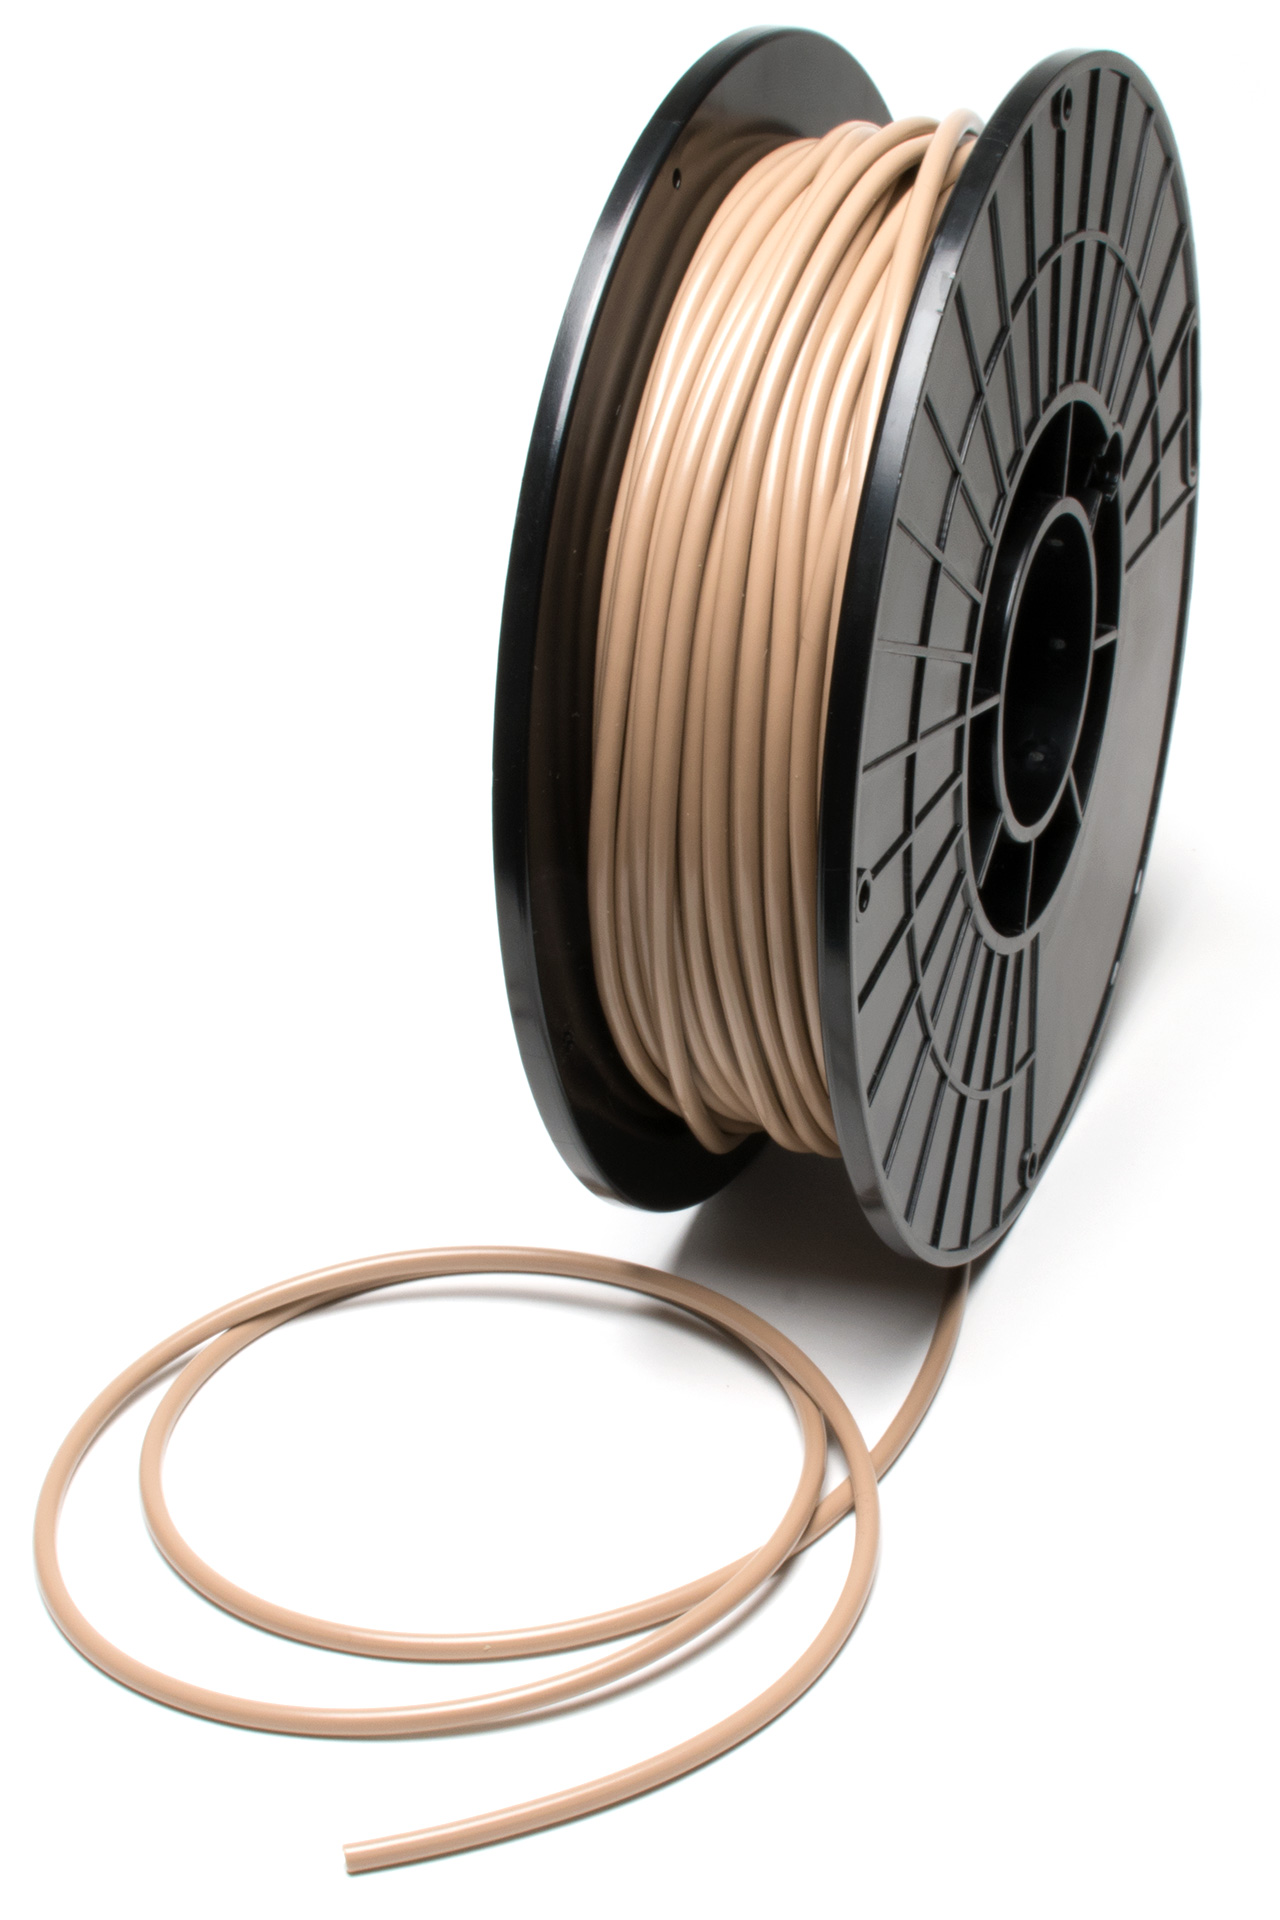 Transit welding cord in tan